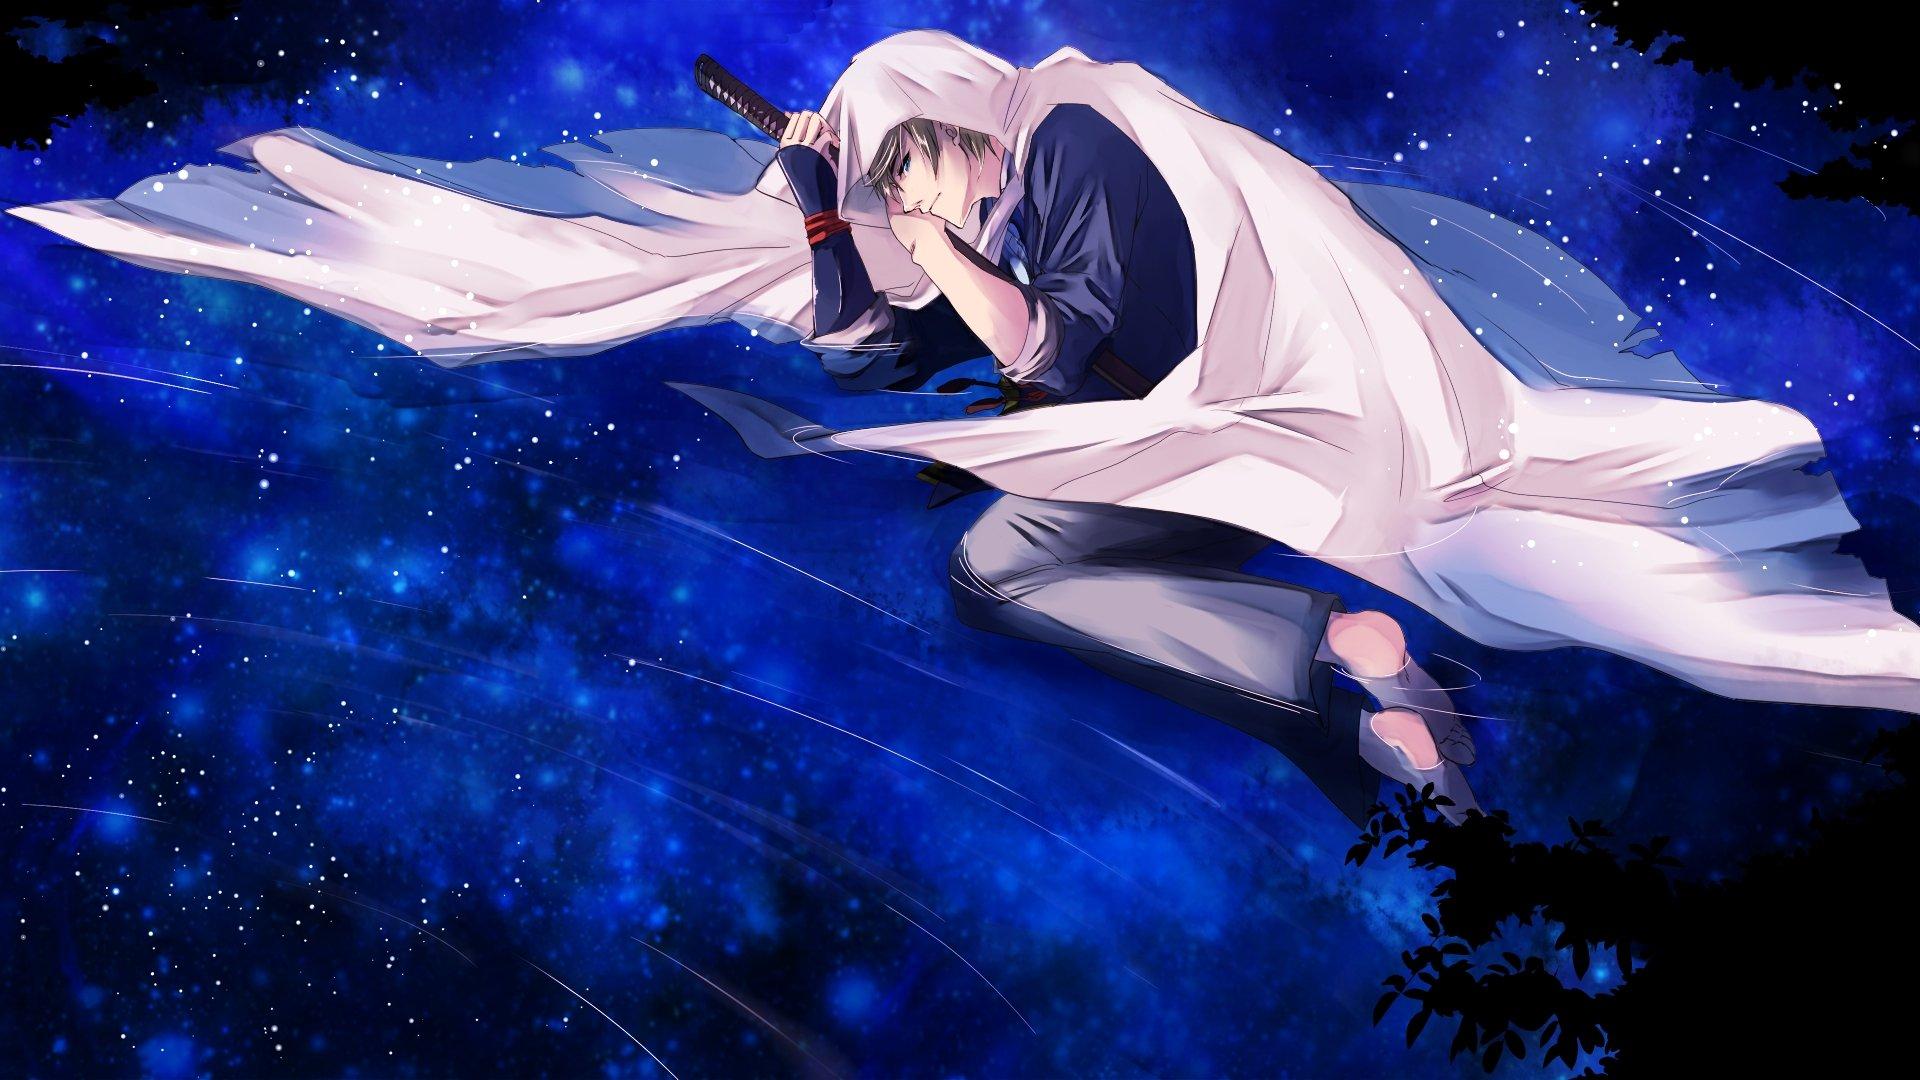 Touken sword blue anime boy wallpaper 1920x1080 629094 - Blue anime wallpaper ...